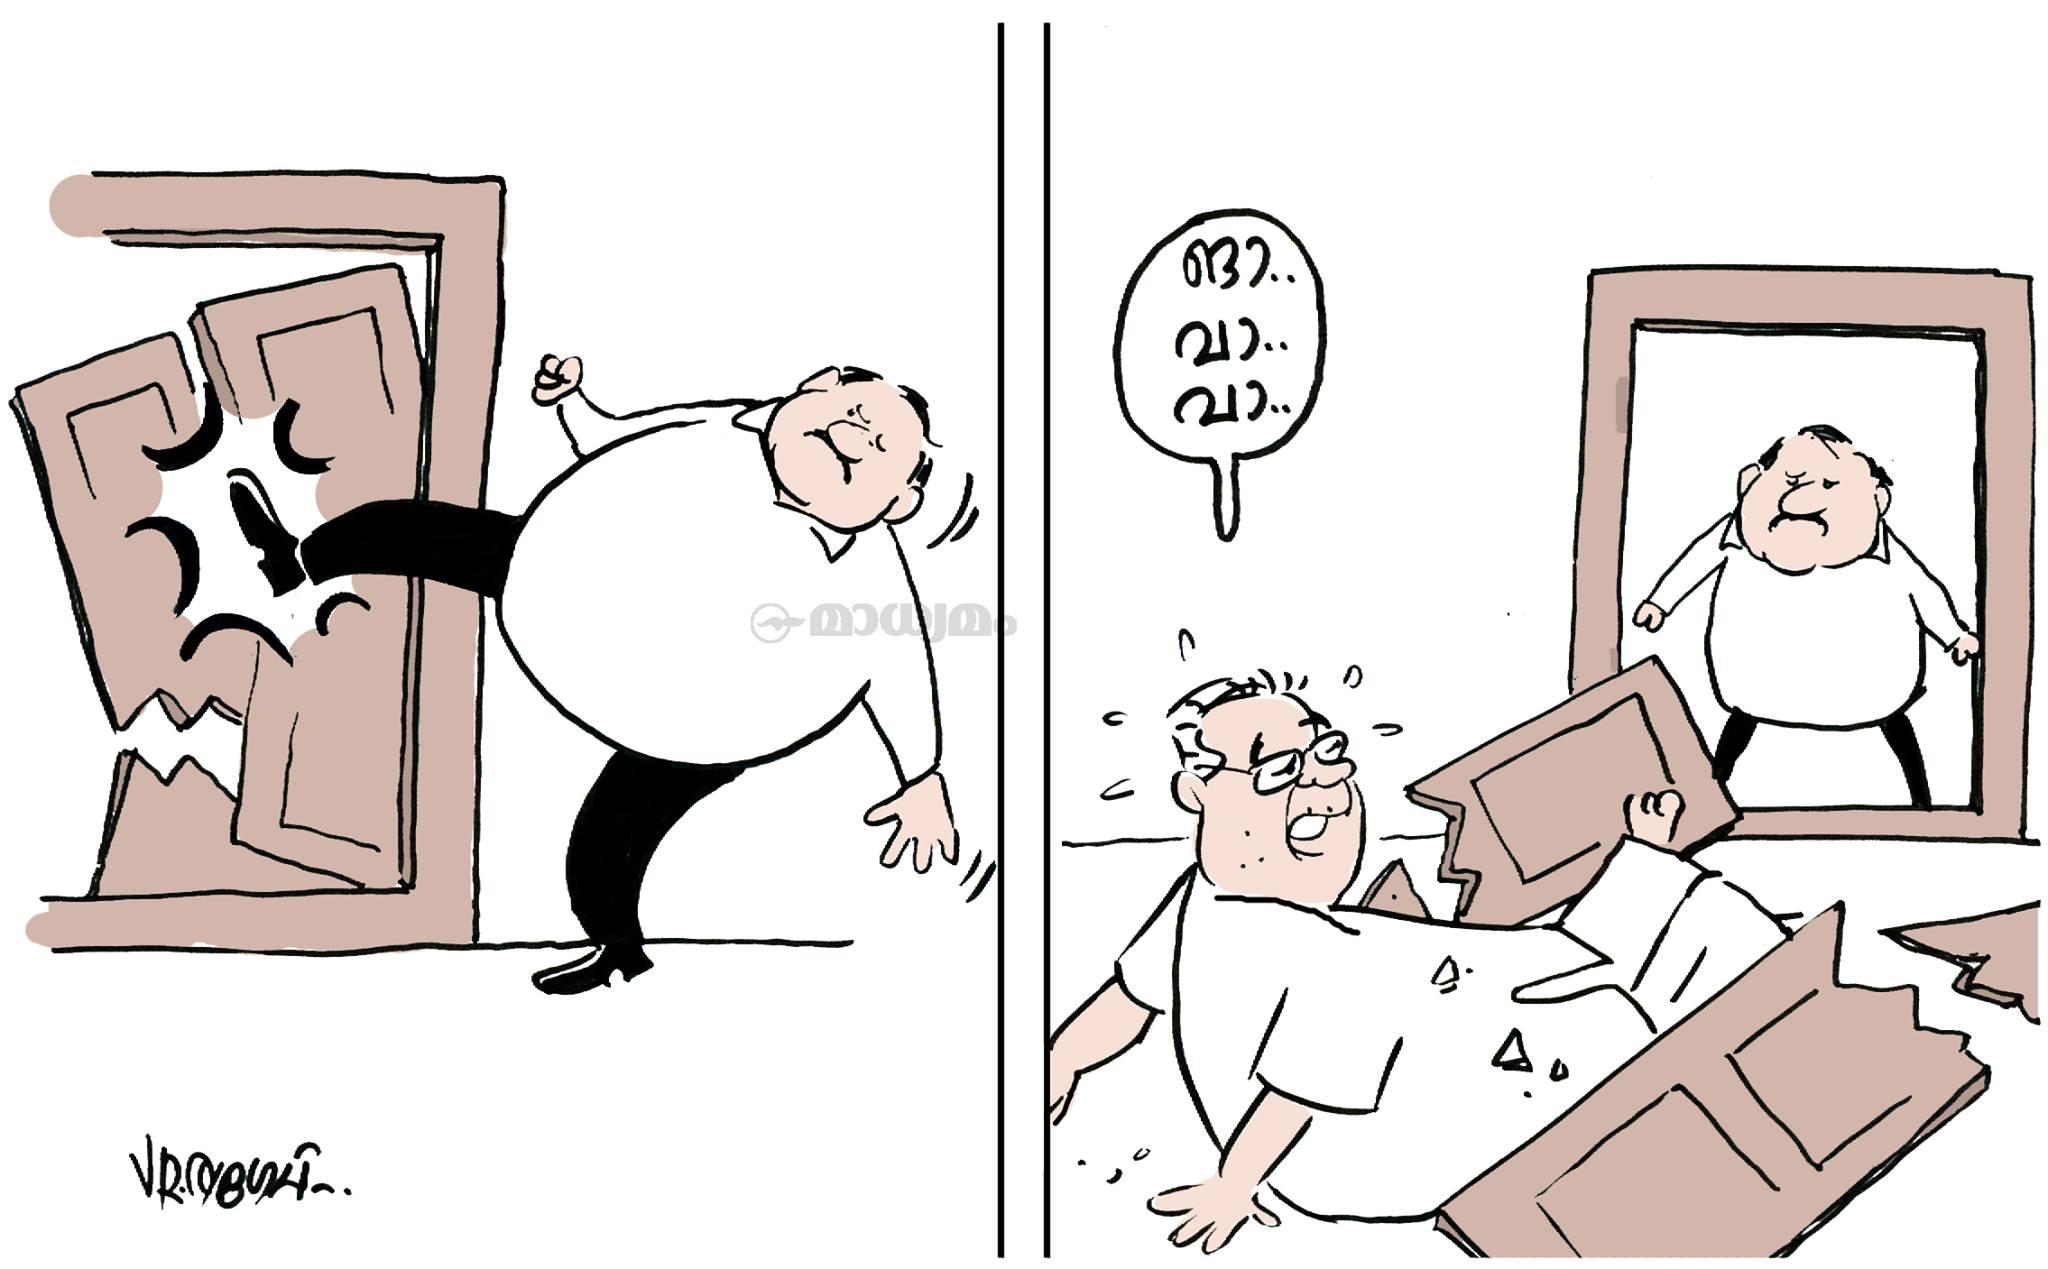 Social inequality inherent in Hindutva; translates into economic inequality: Amartya Sen